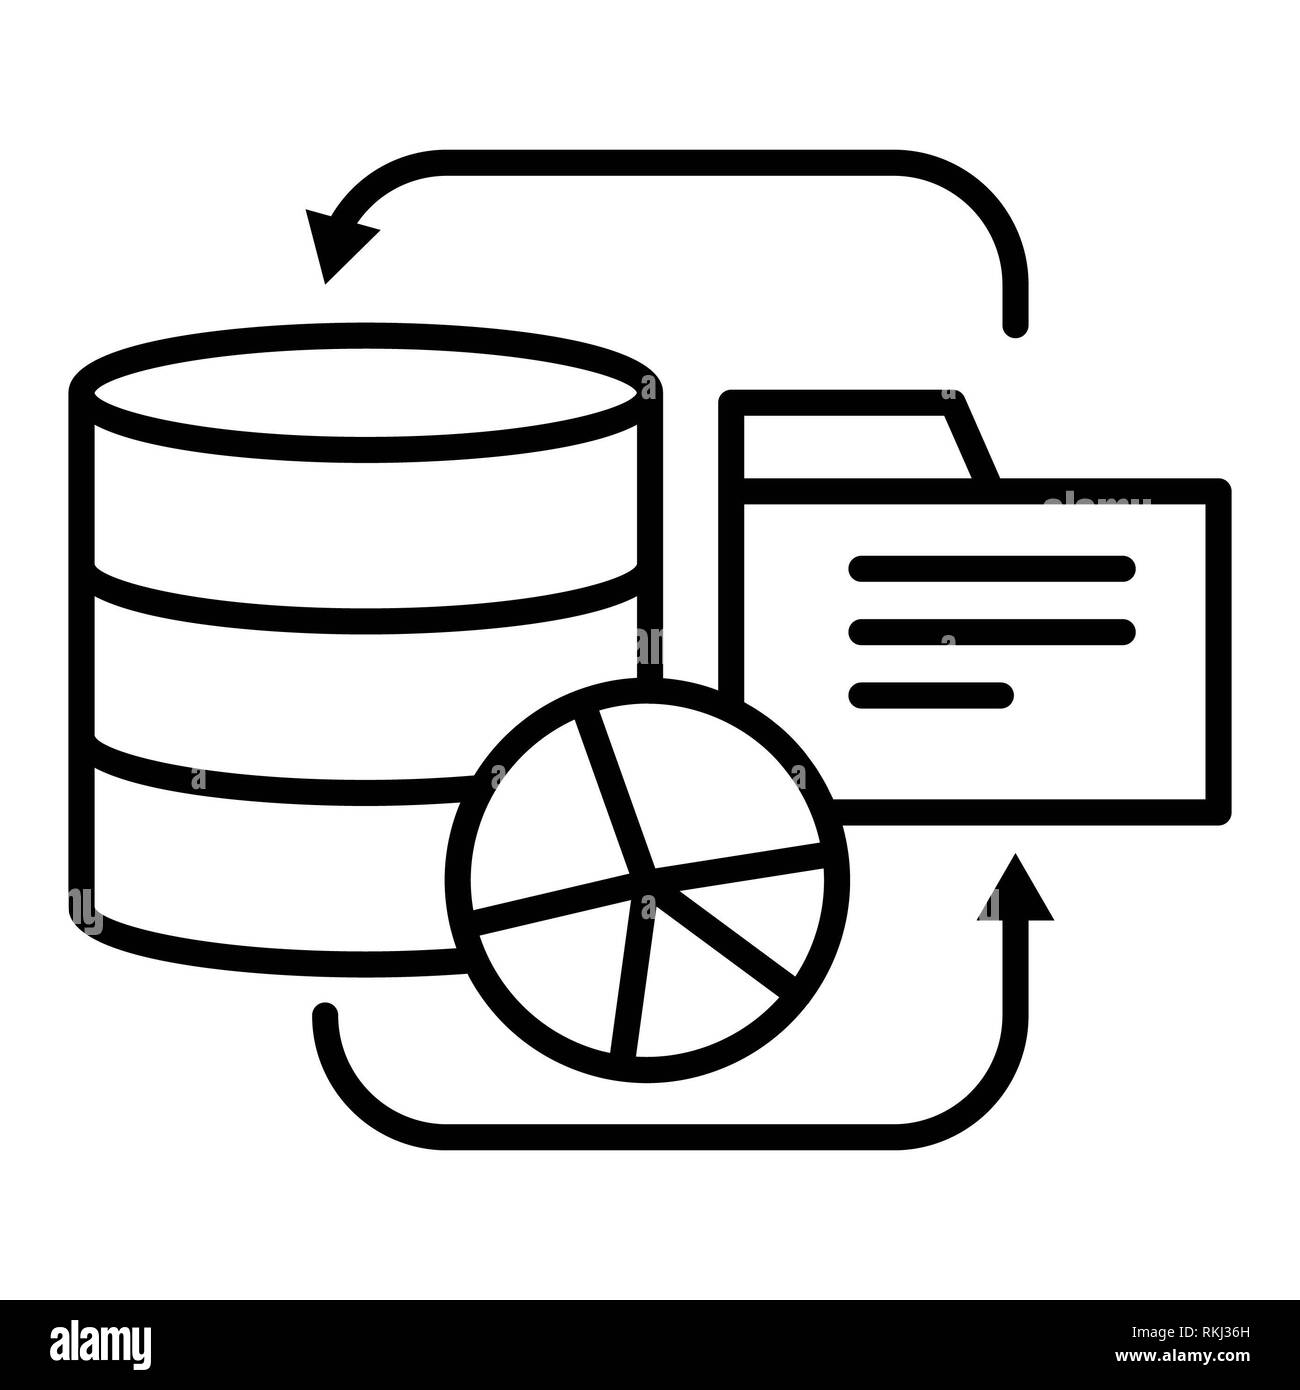 Database Black and White Stock Photos & Images - Alamy